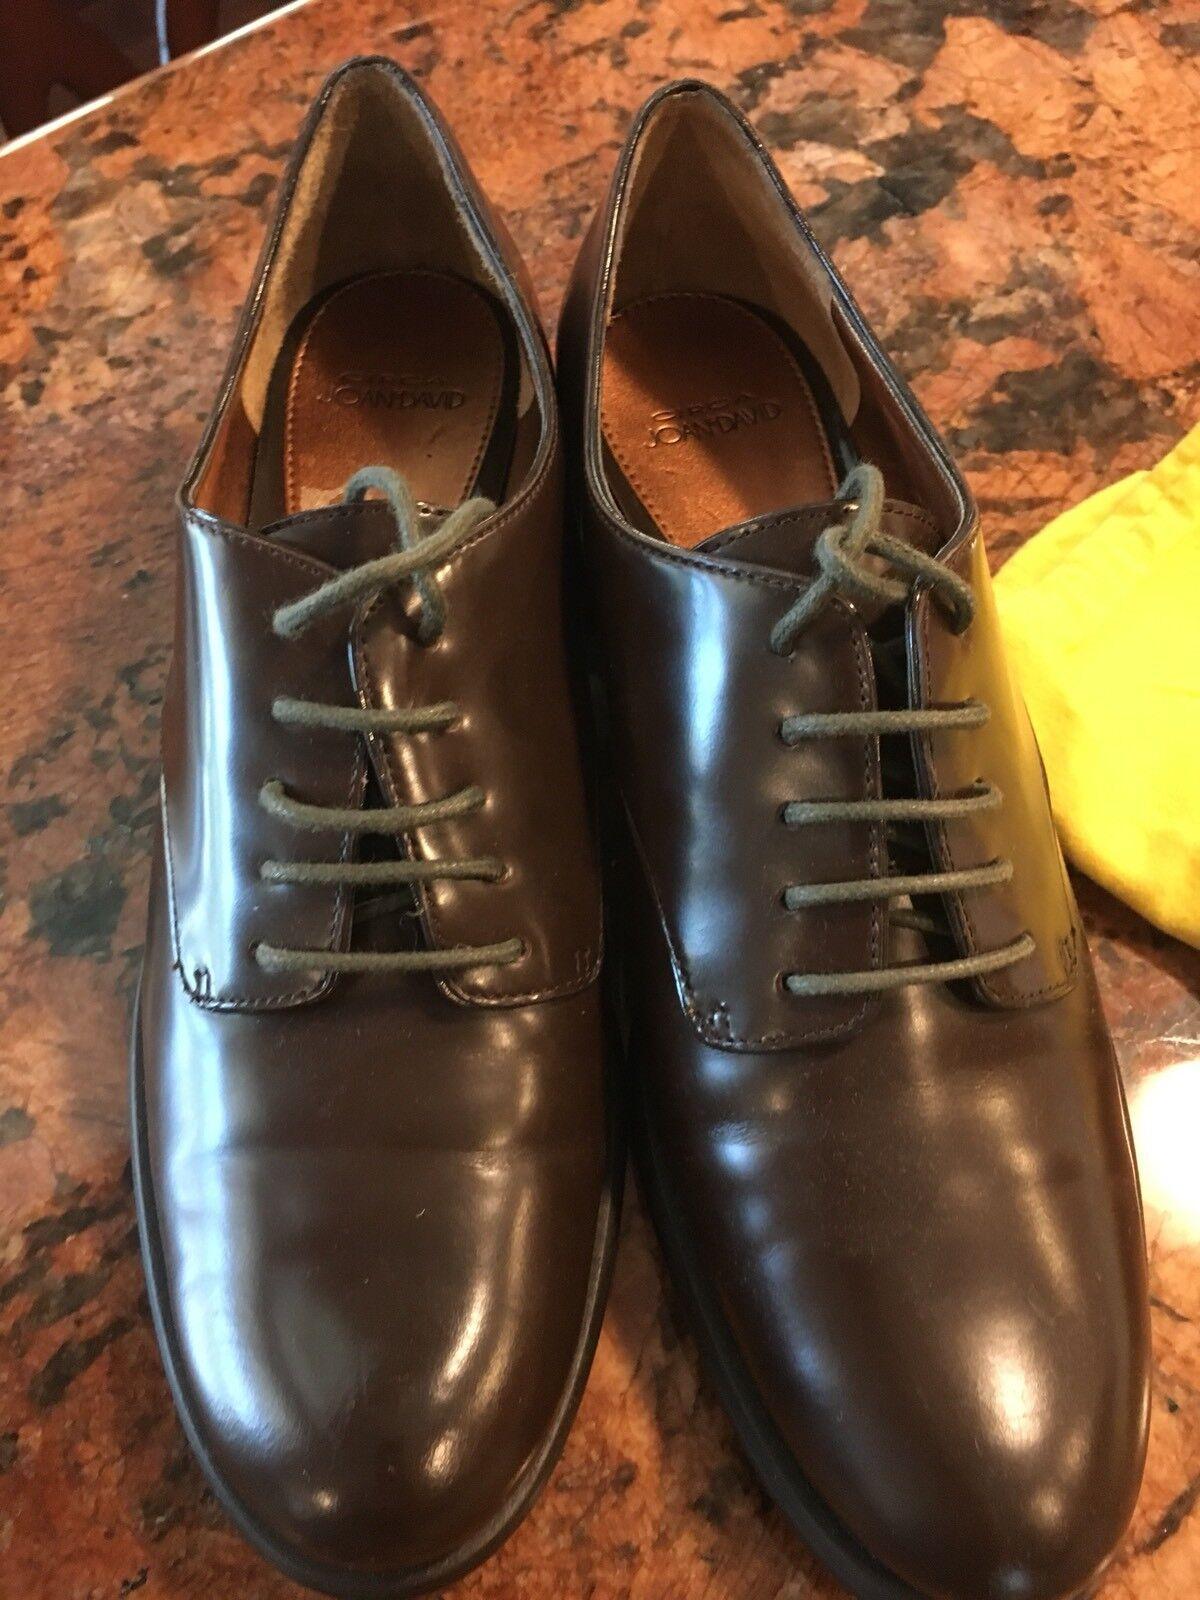 Circa Joan And David 7M Brown Oxford Wingtip Women's shoes